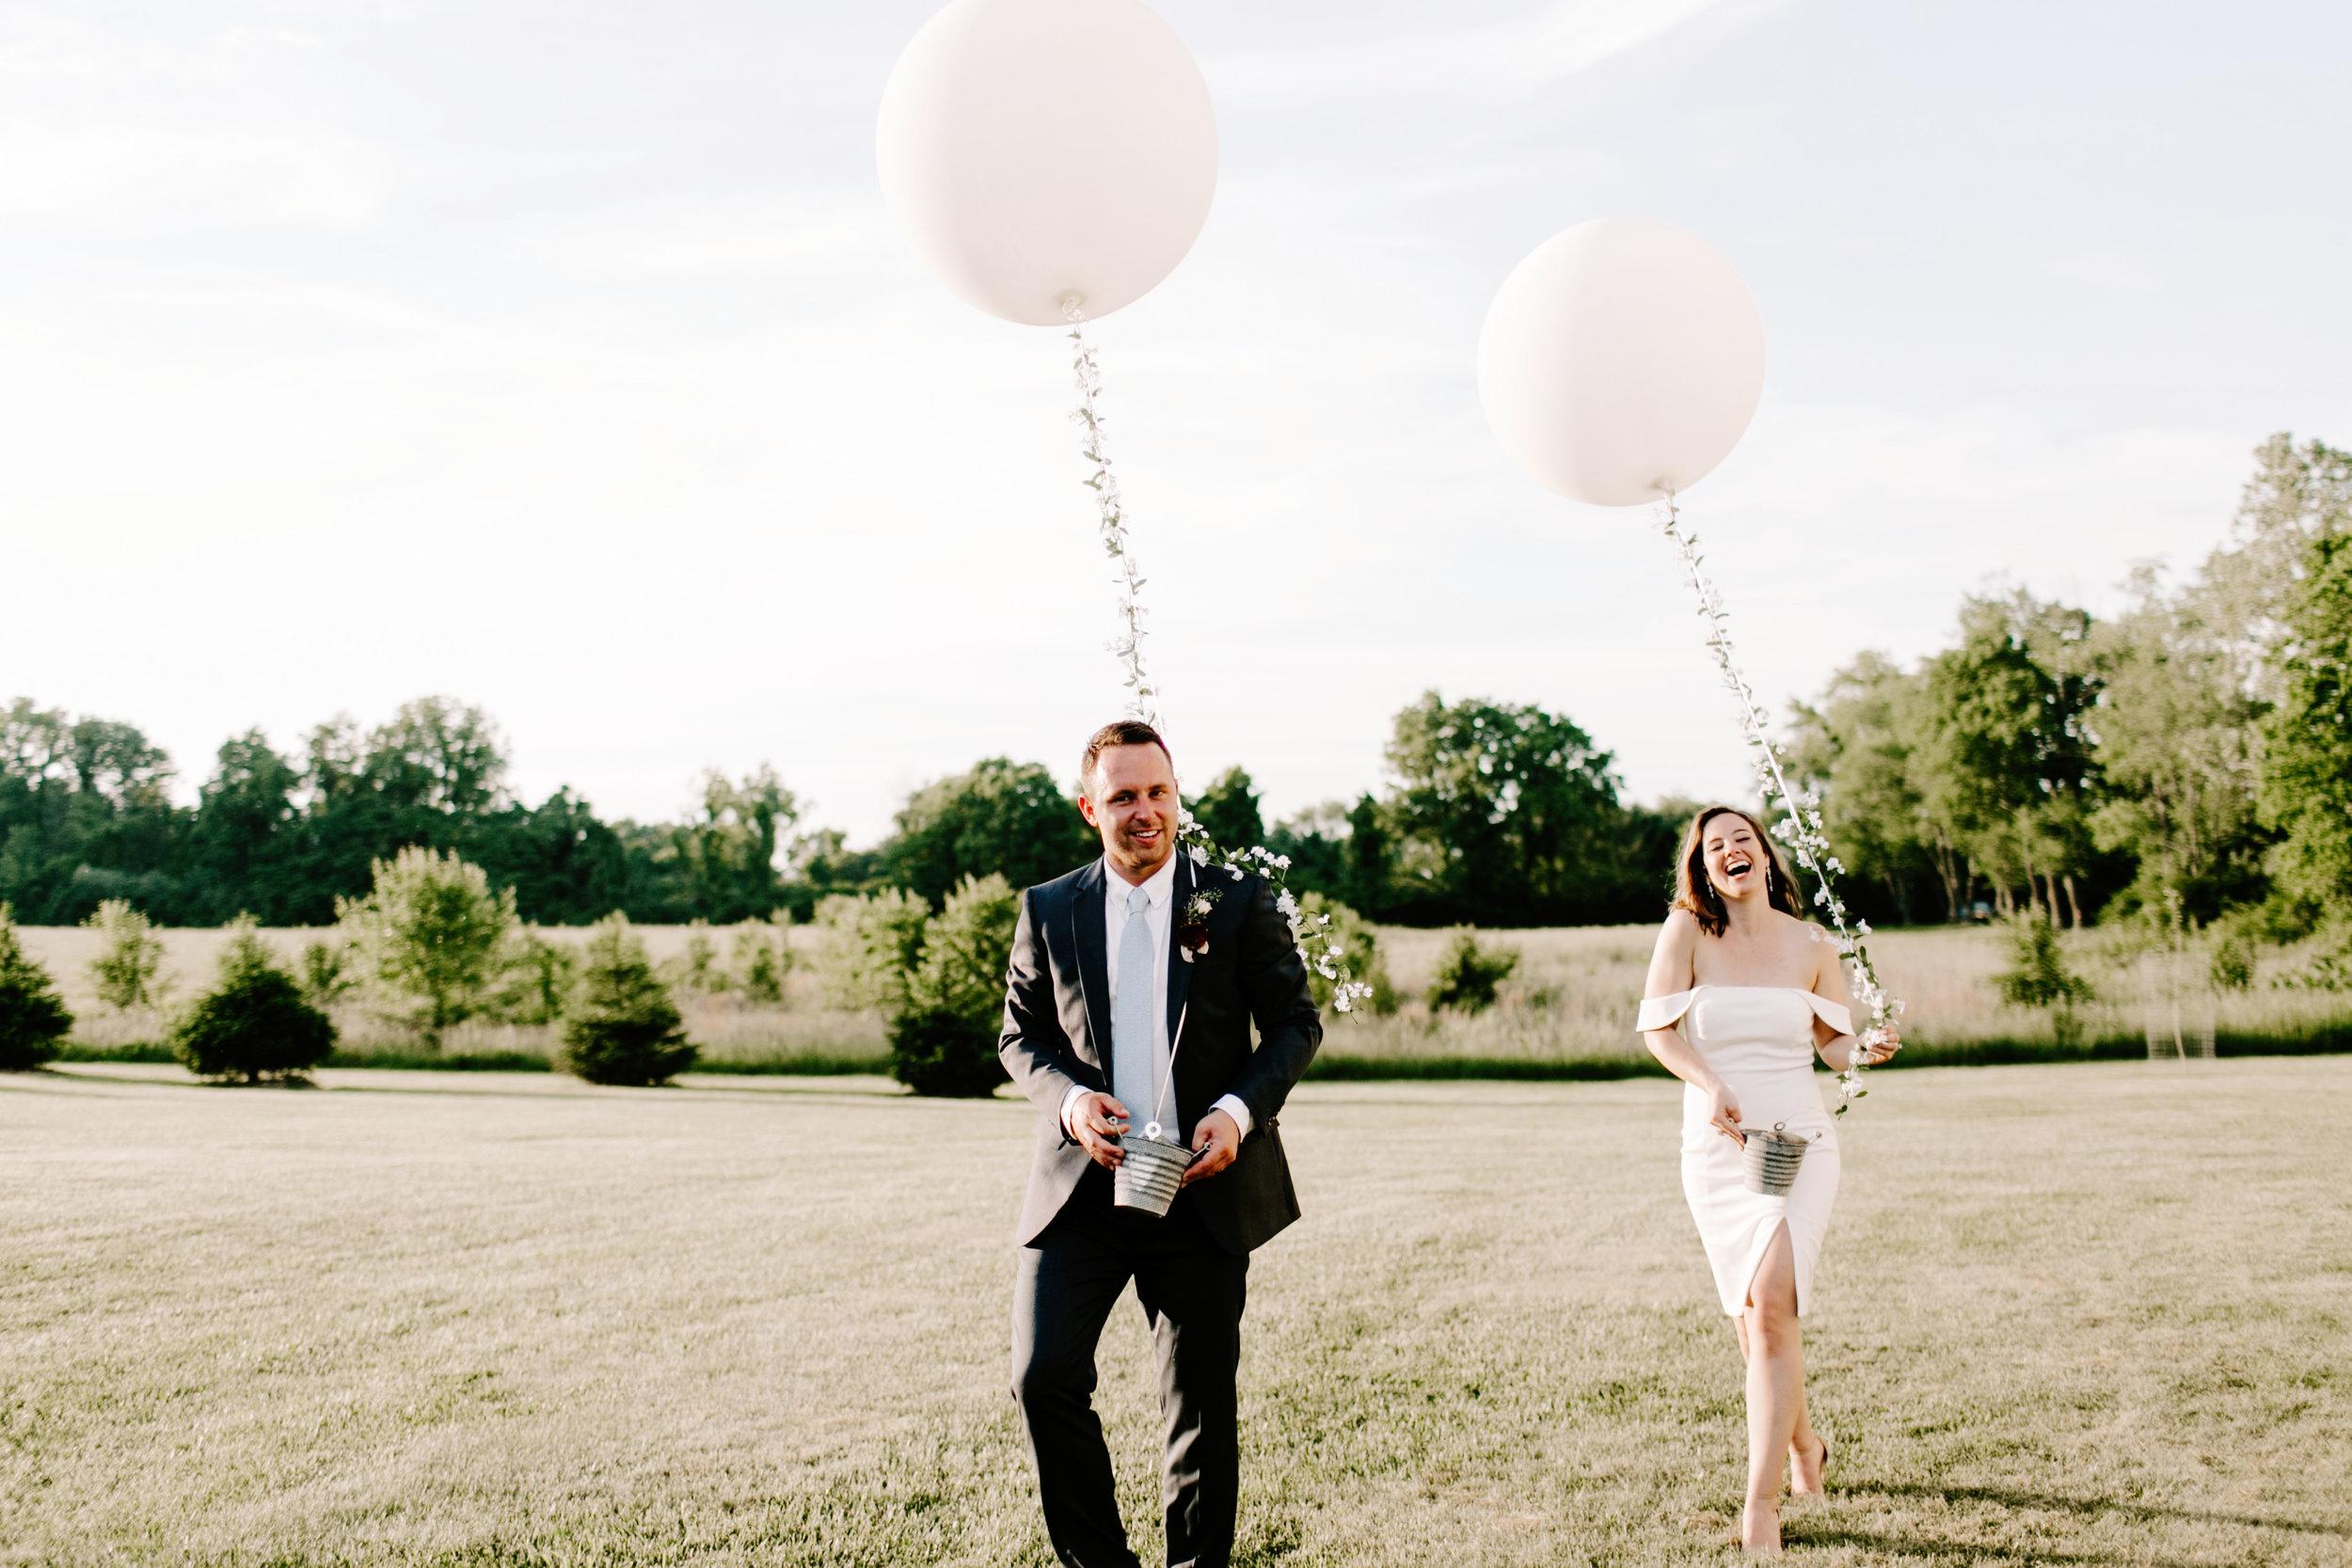 Liz_and_Jacob_surprise_wedding_Bloomington_Indiana_Emily_Elyse_Wehner_Photography_LLC-744.jpg